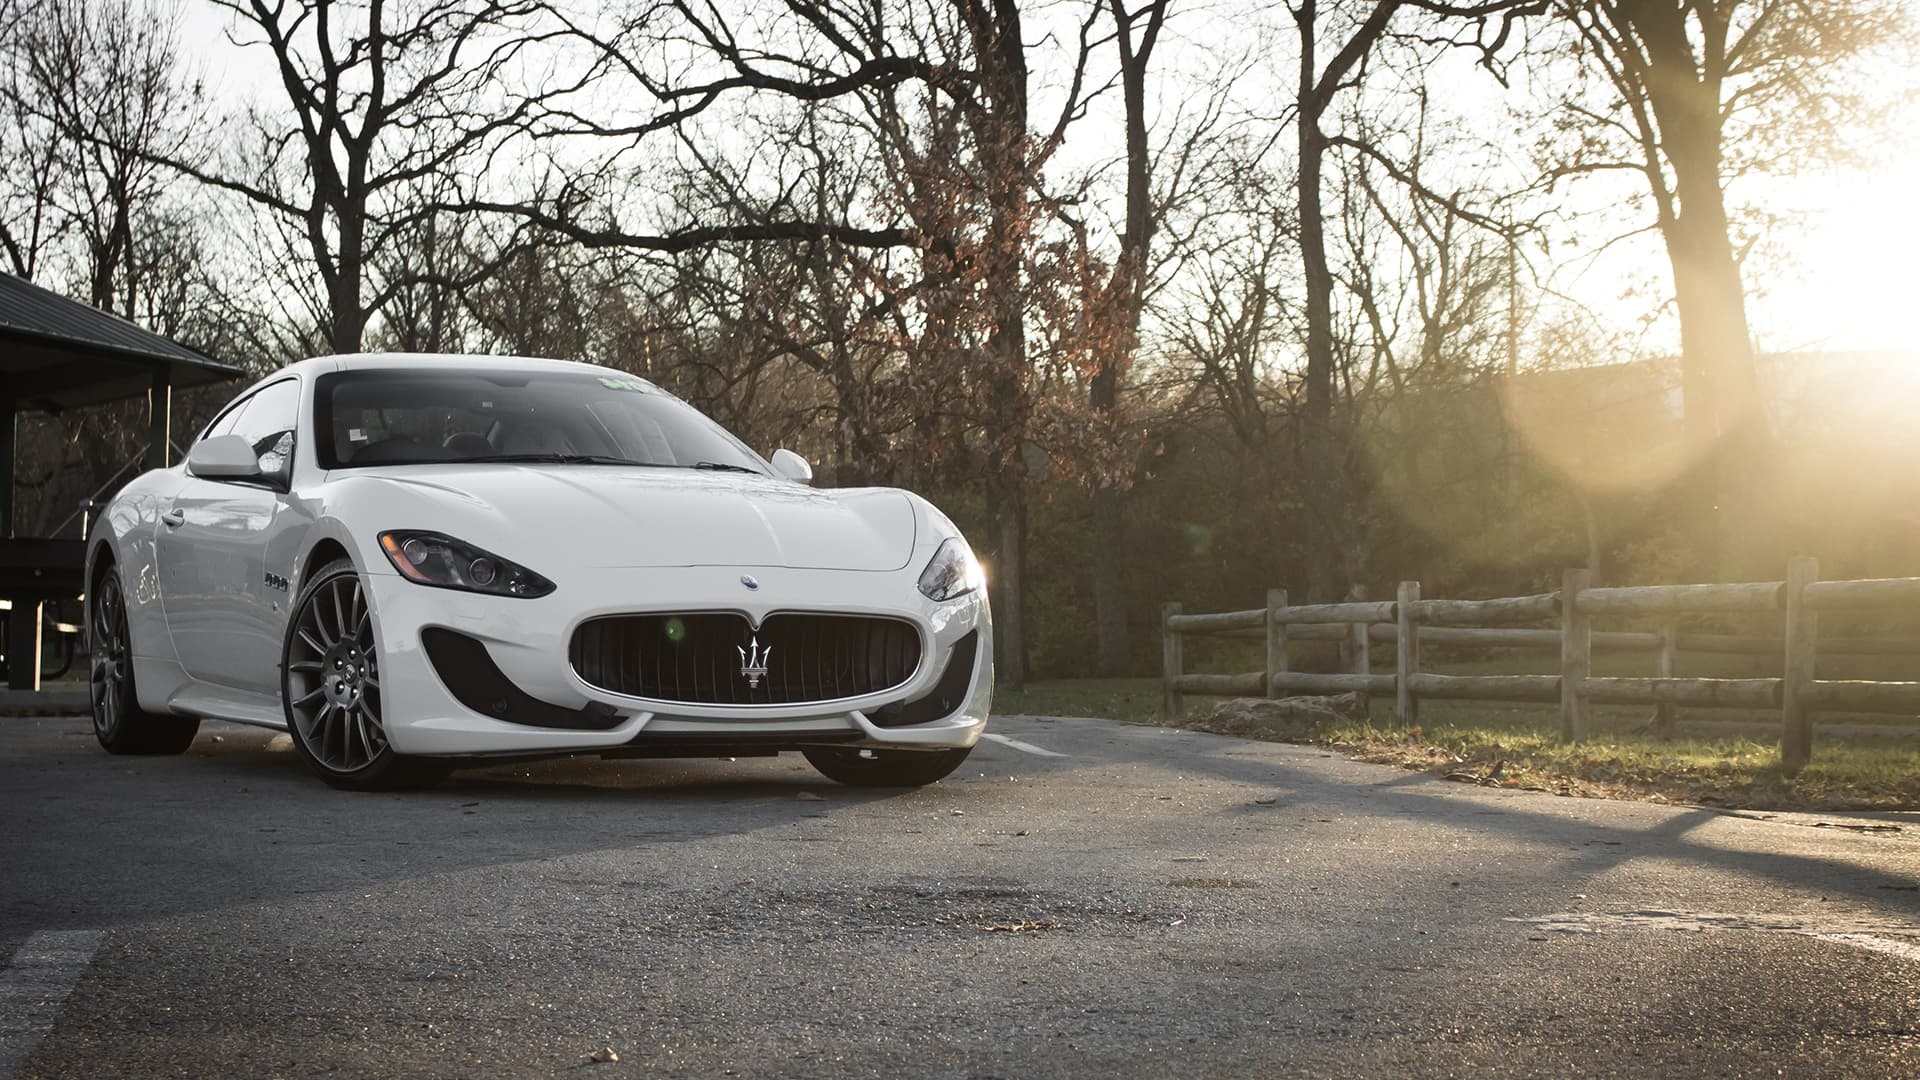 30 Maserati GranTurismo wallpapers High Resolution Download 1920x1080